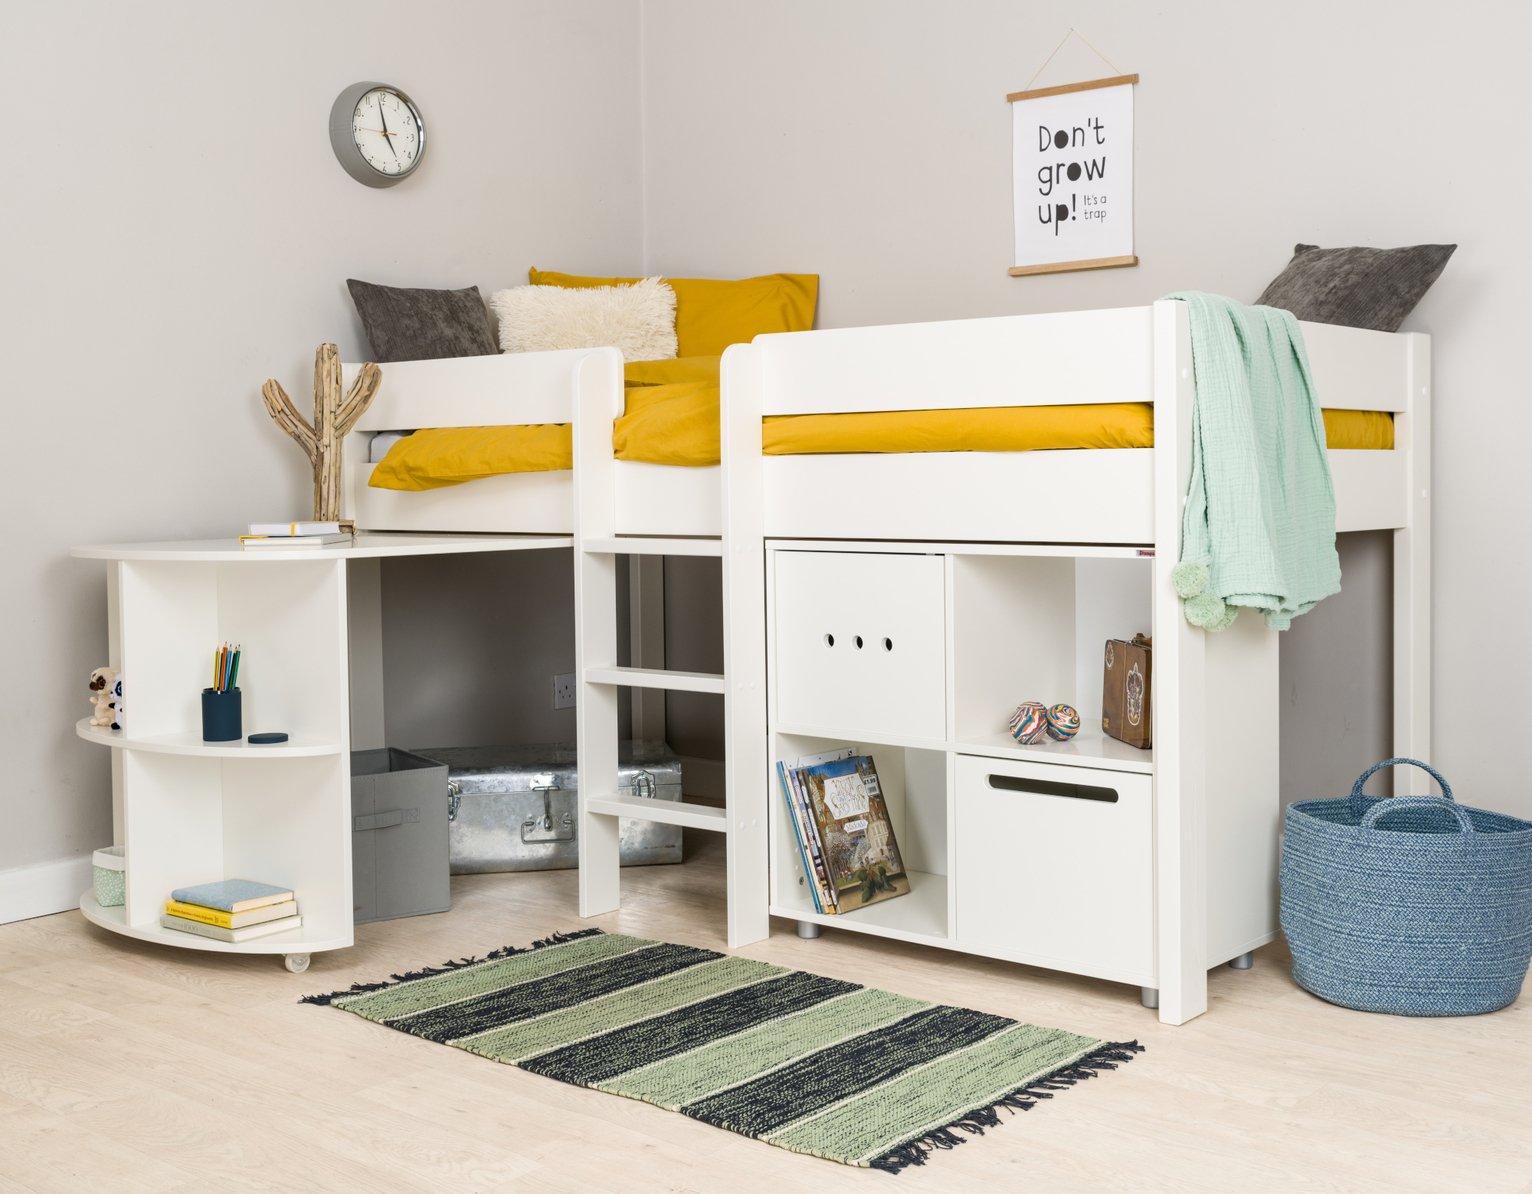 Stompa Mid Sleeper Bed, Desk, Cube Unit & Mattress